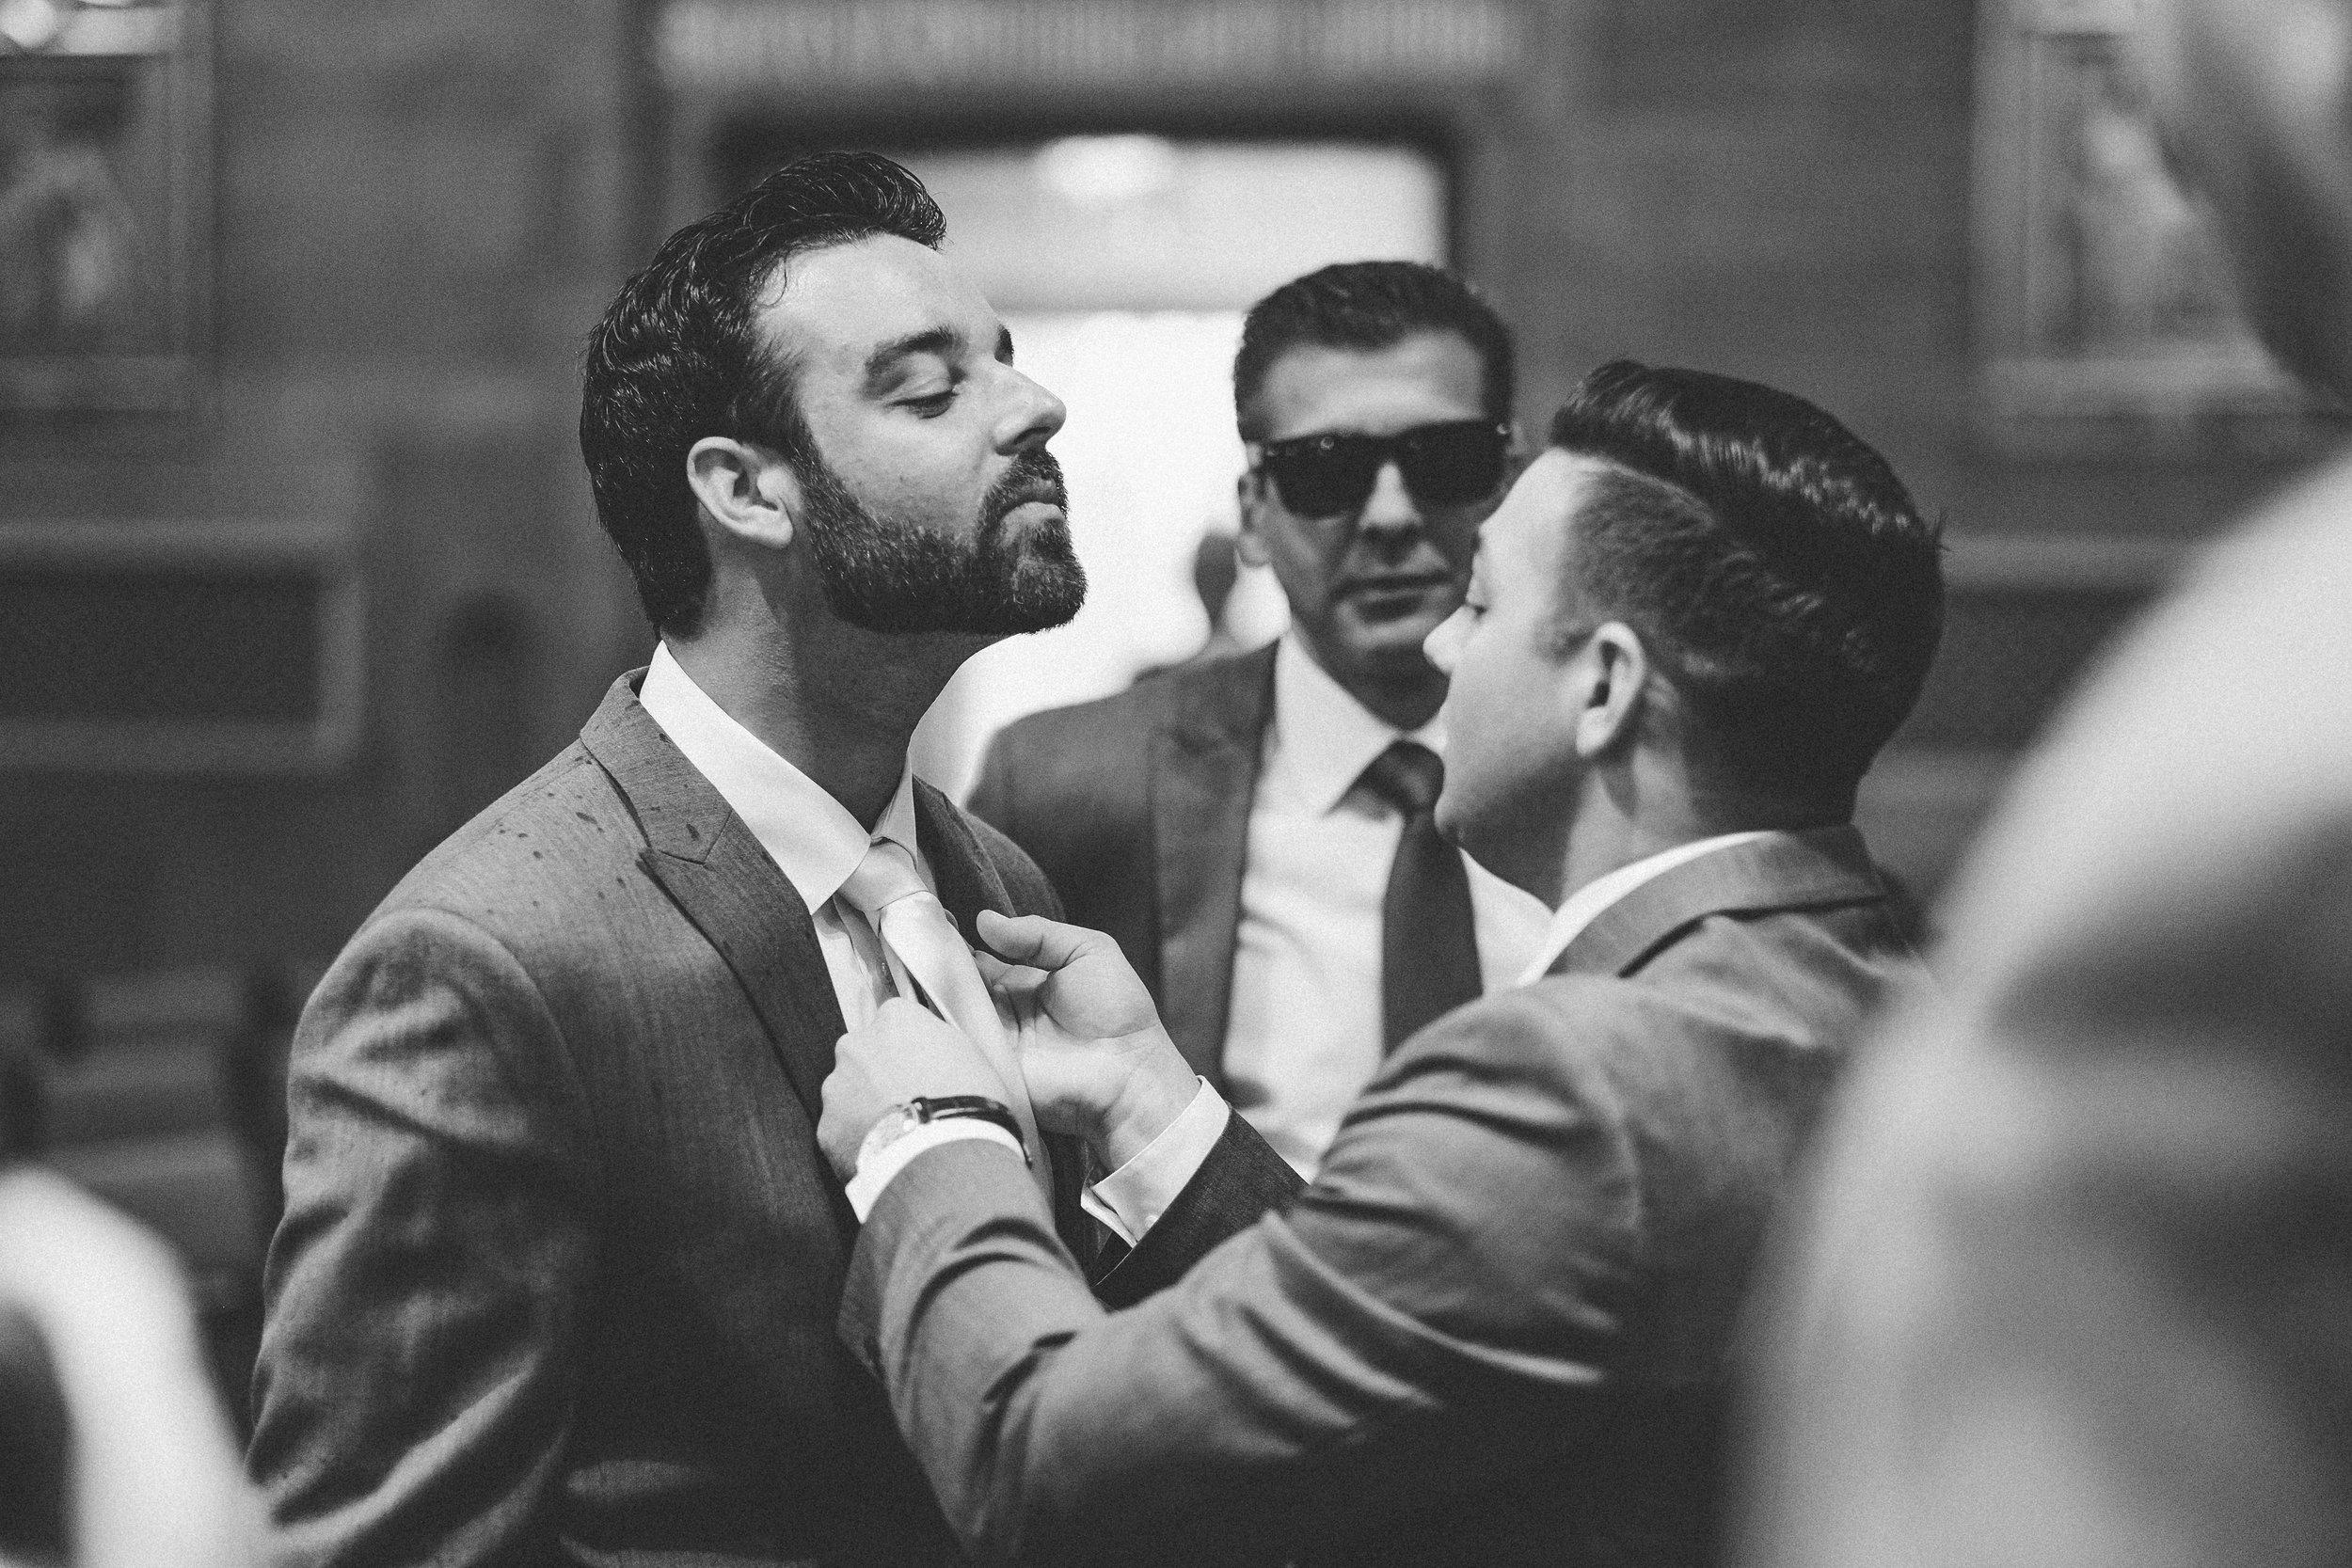 boston-wedding-photography-209.jpg